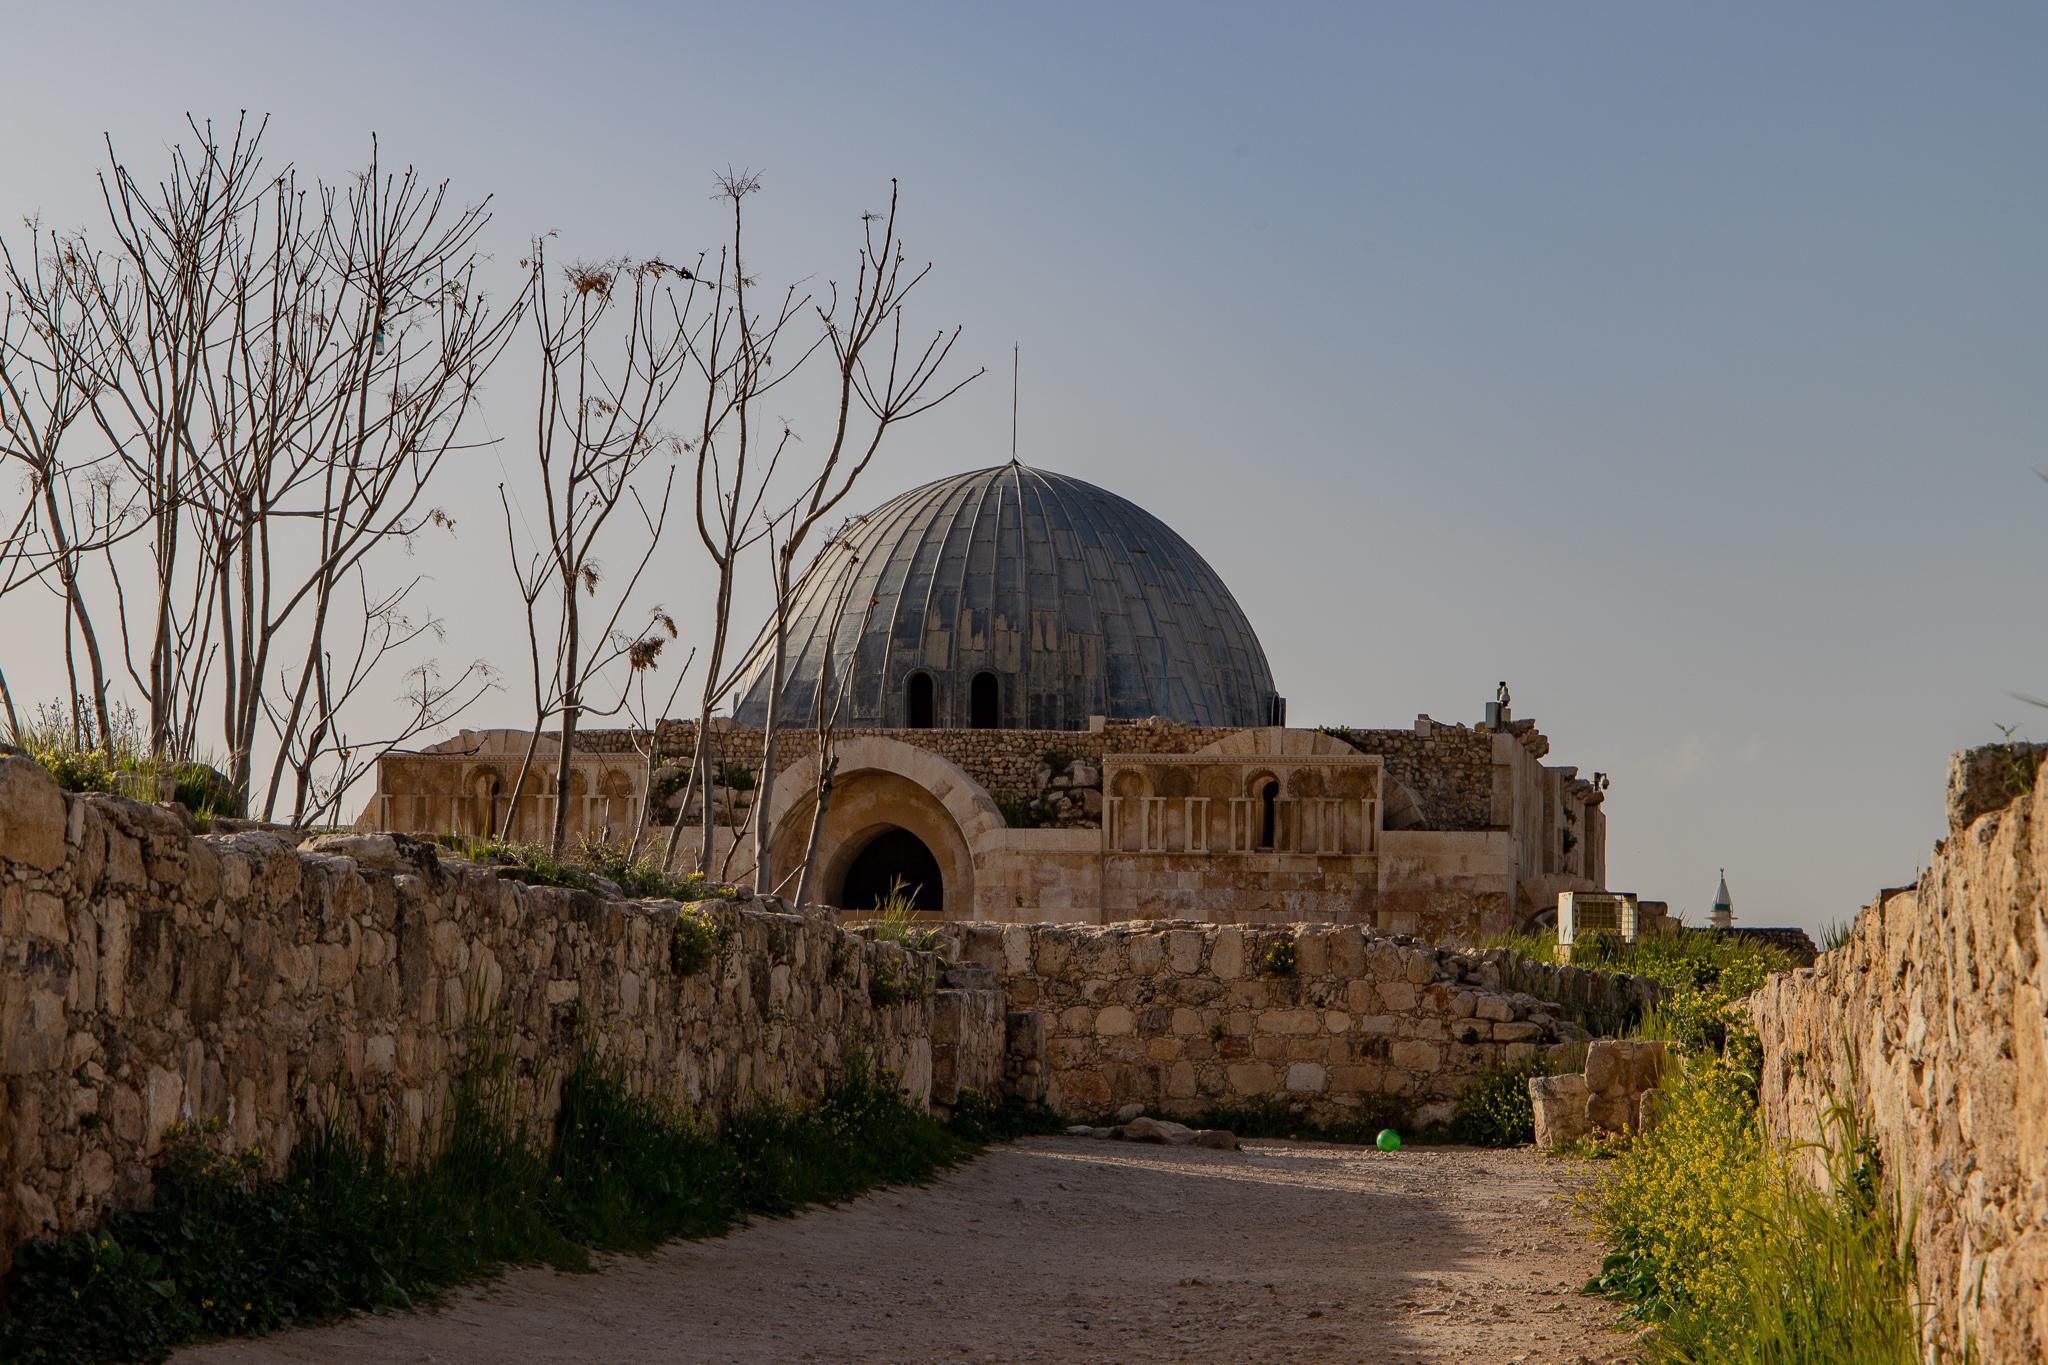 Walking through history to the Ummayad period